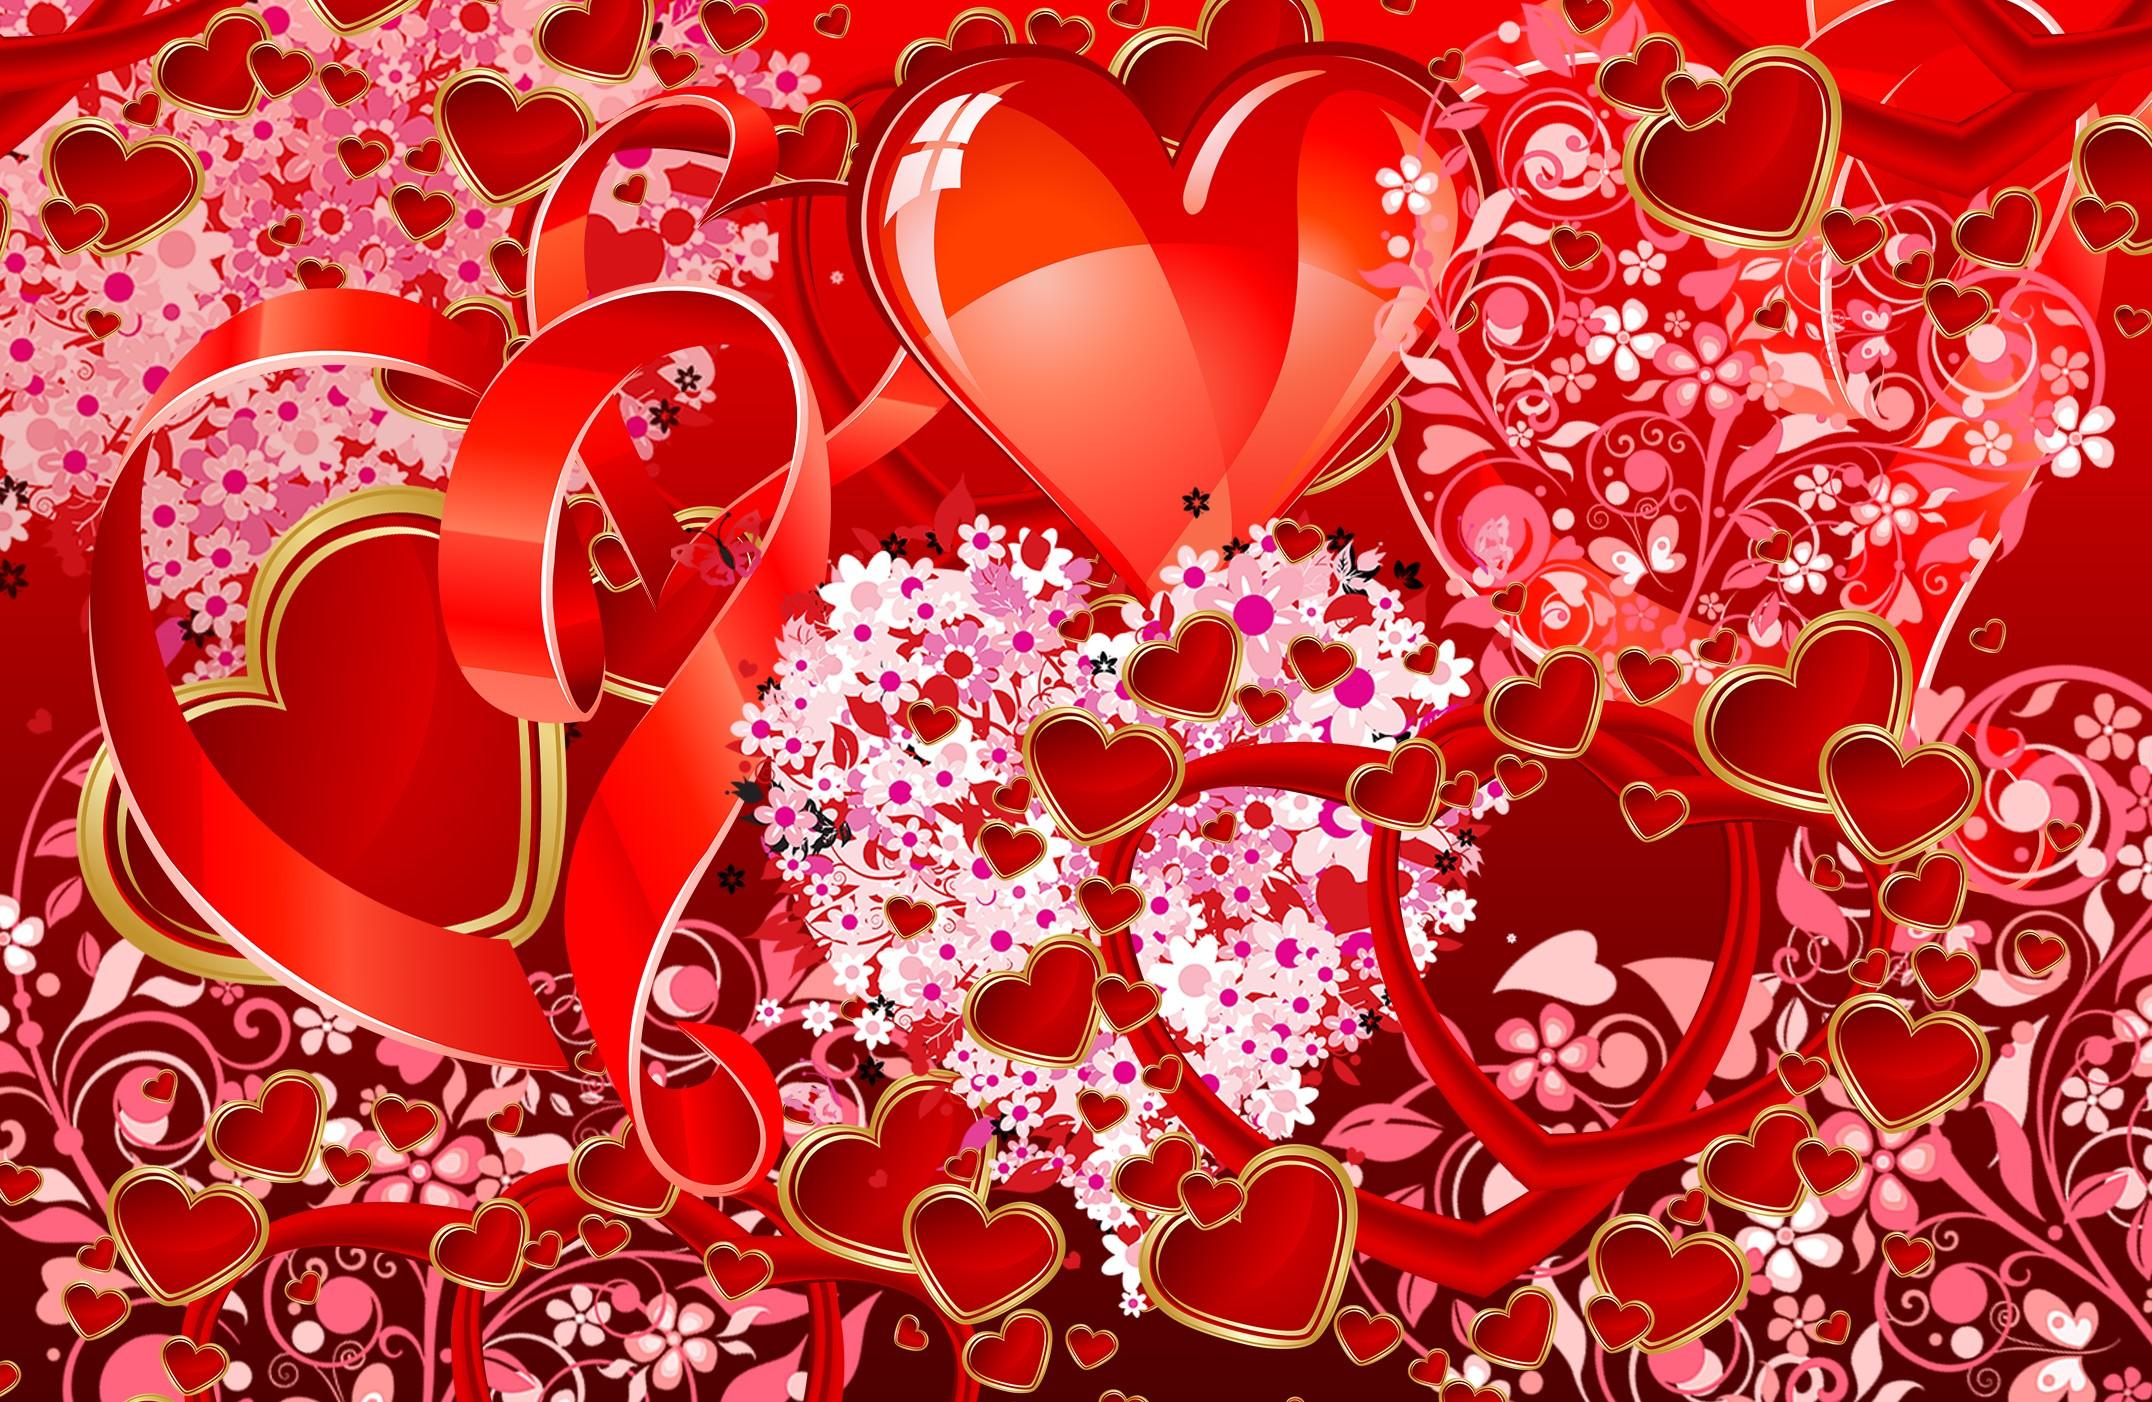 Valentines Day Background ·① Download Free High Resolution